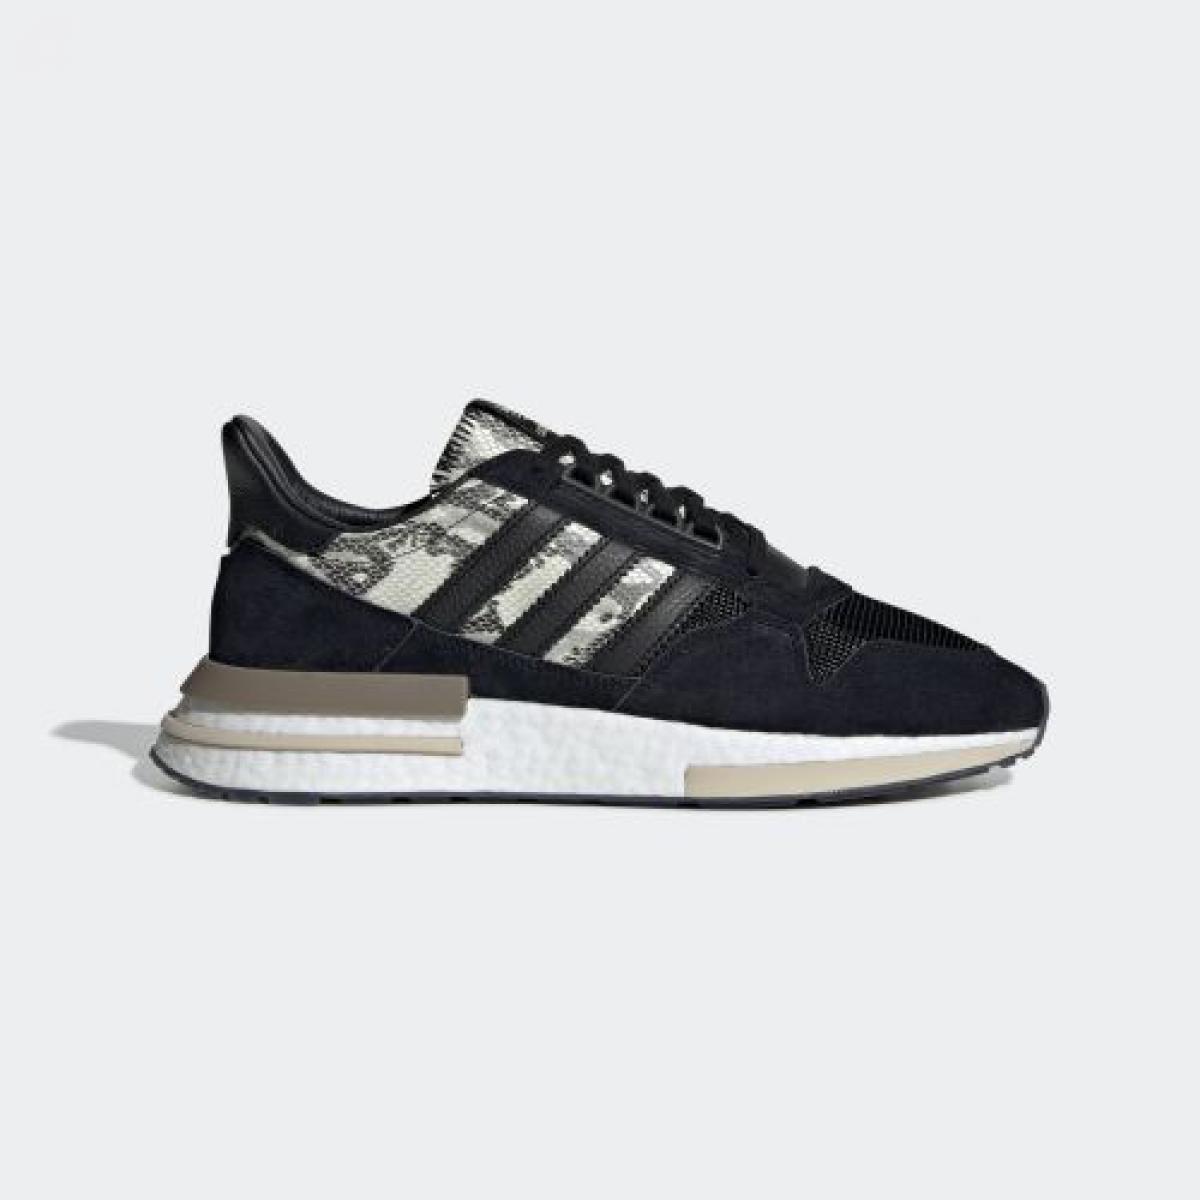 Adidas adidas ZX 500 RM Lady's men originals shoes sneakers BD7924